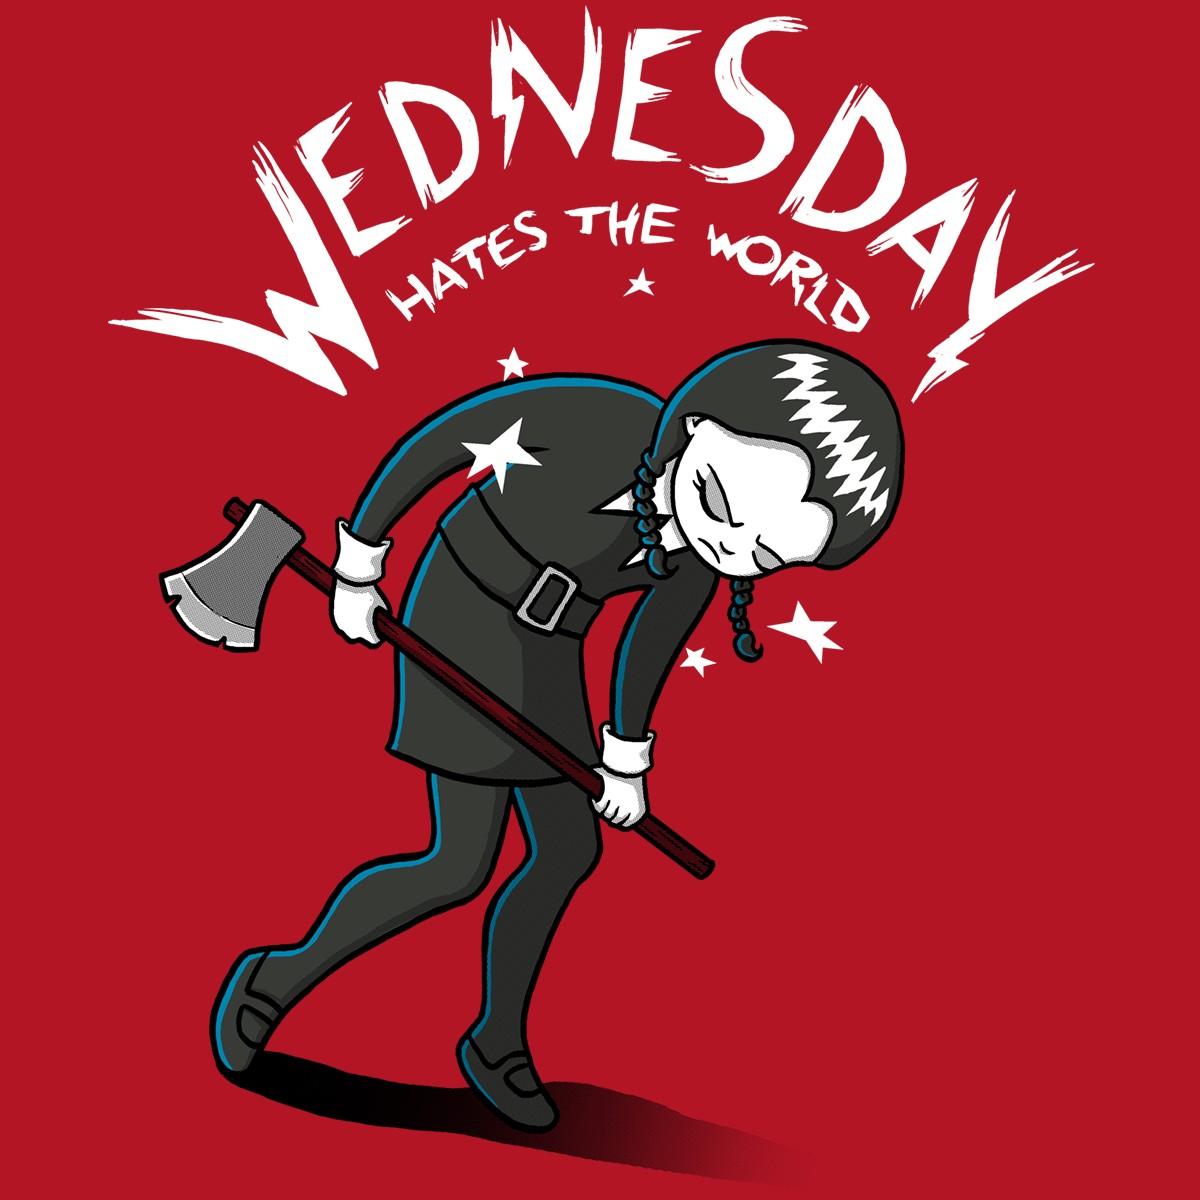 Wednesday Hates The World